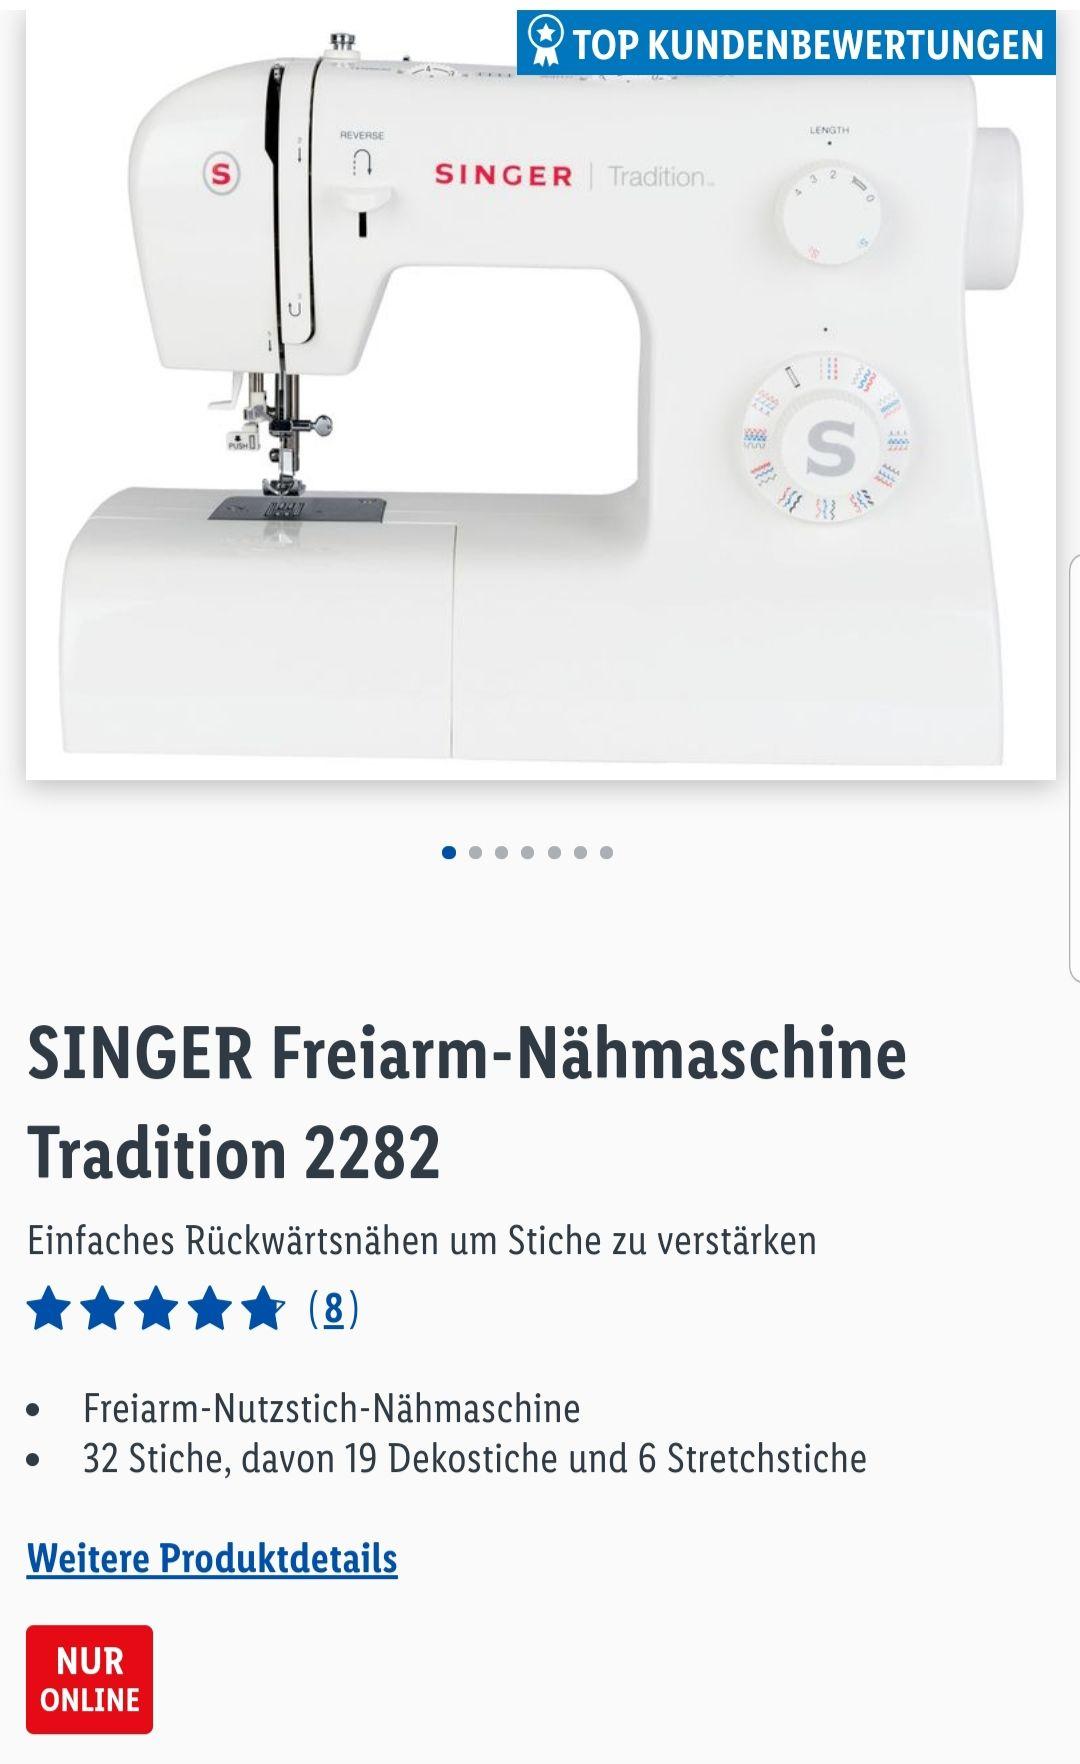 Singer Nähmaschine 2282 Tradition